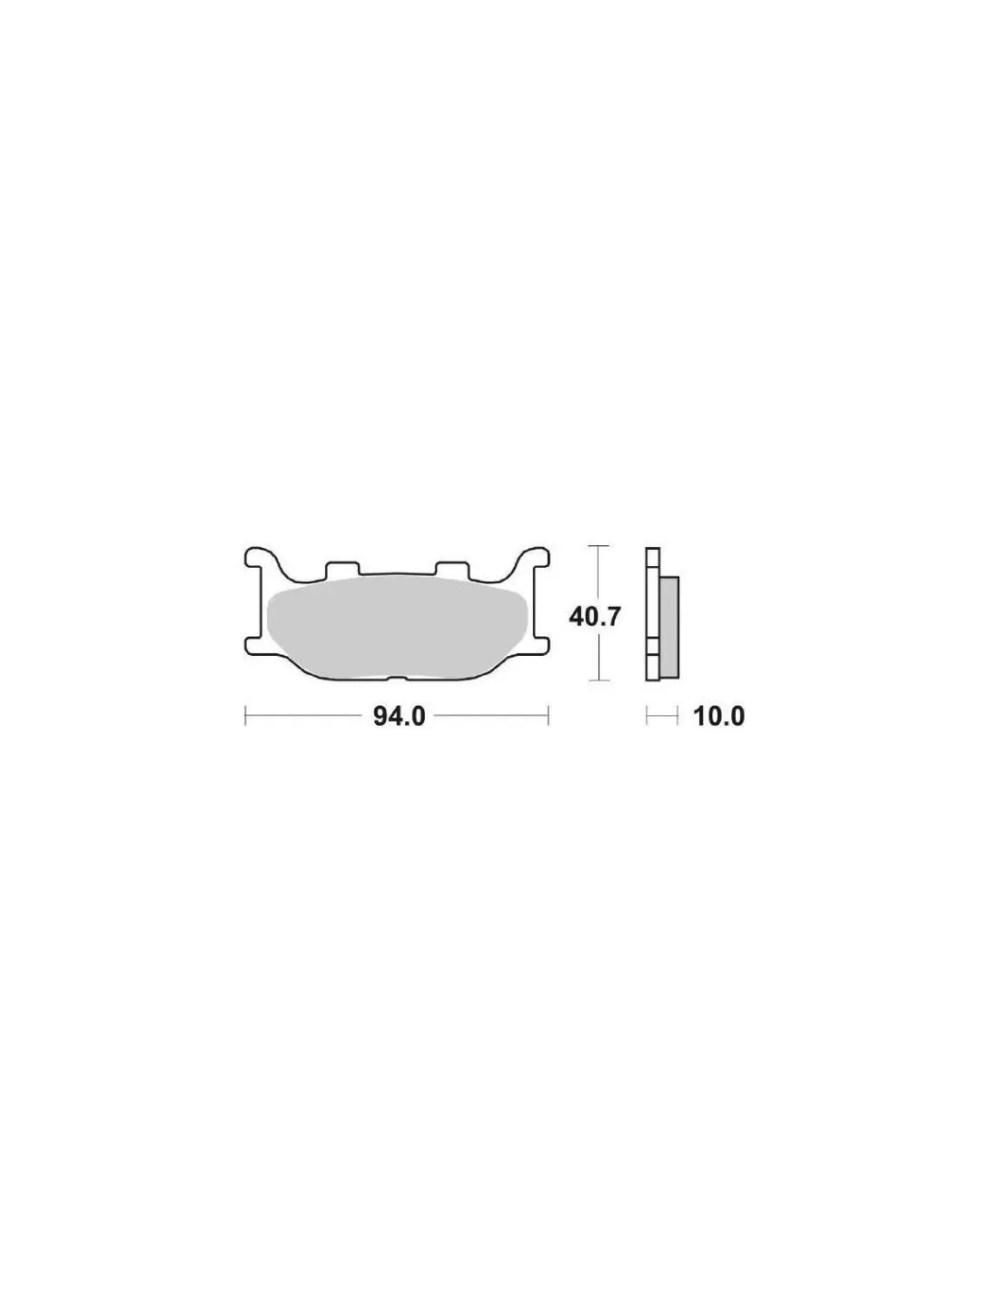 medium resolution of yamaha majesty wiring diagram wiring diagram libraries rh w6 mo stein de yamaha yp 125 majesty